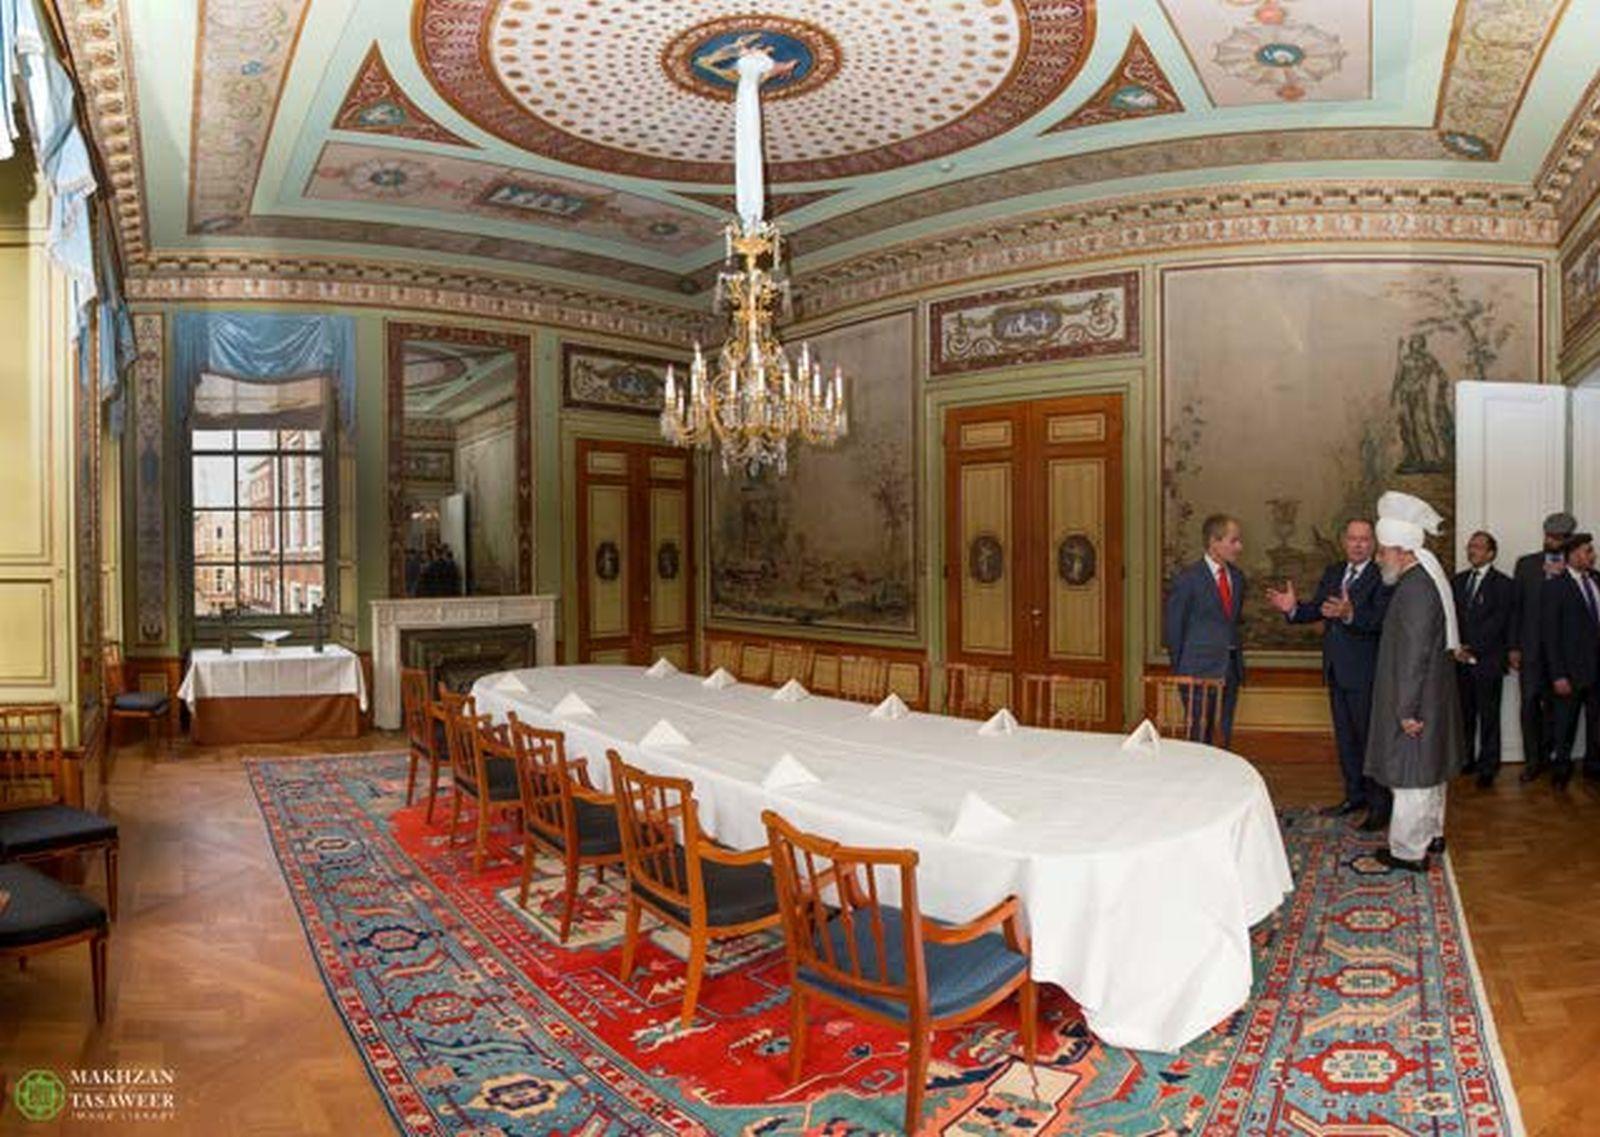 2015-10-06-NLD-Hage-parlamenti-i-holandes-015